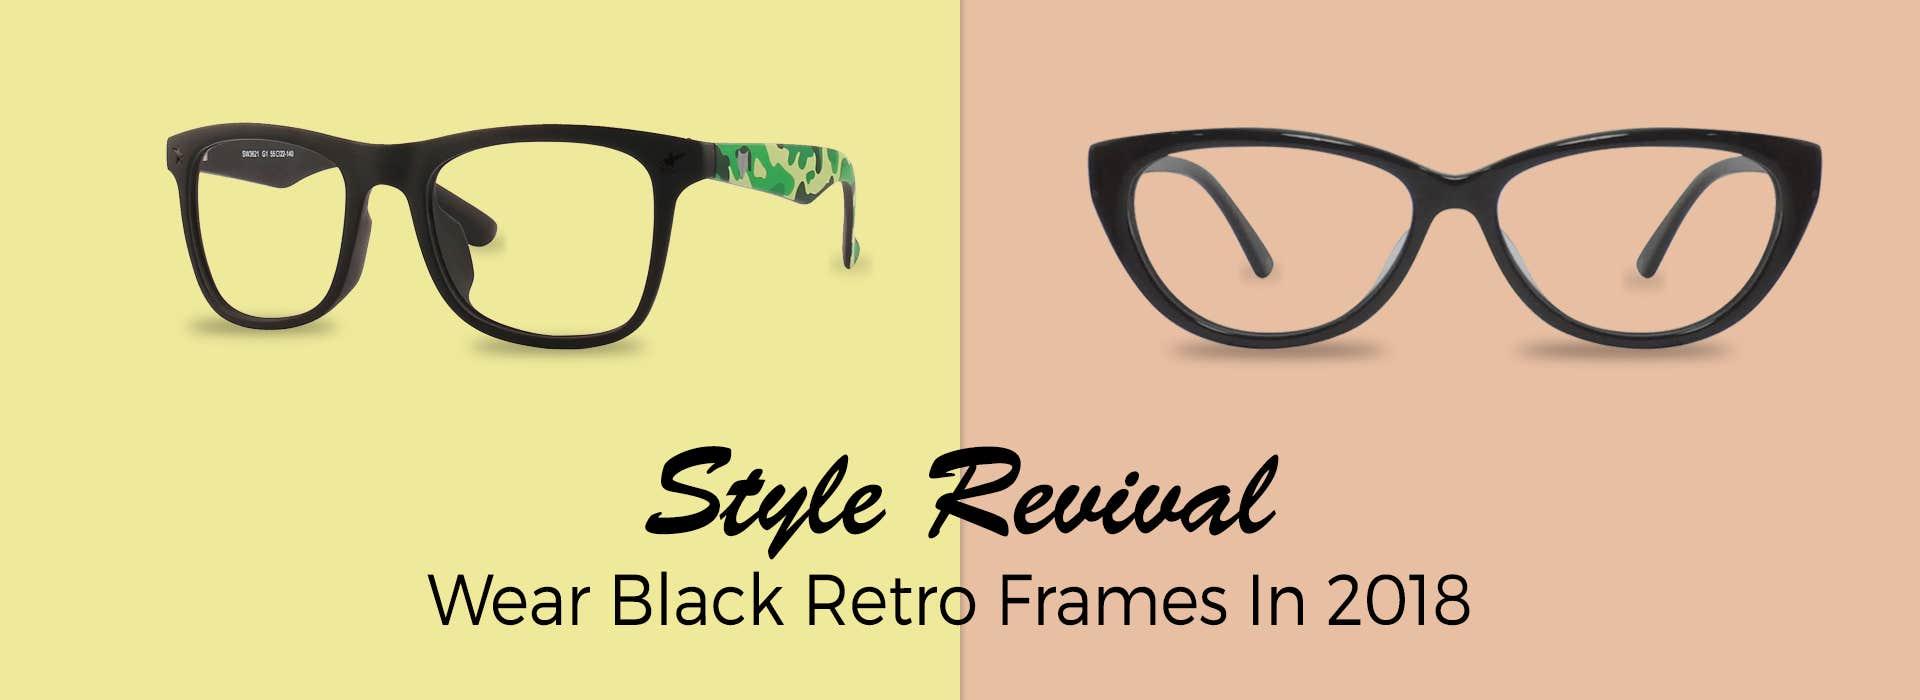 Style Revival: Wear Black Retro Frames In 2018